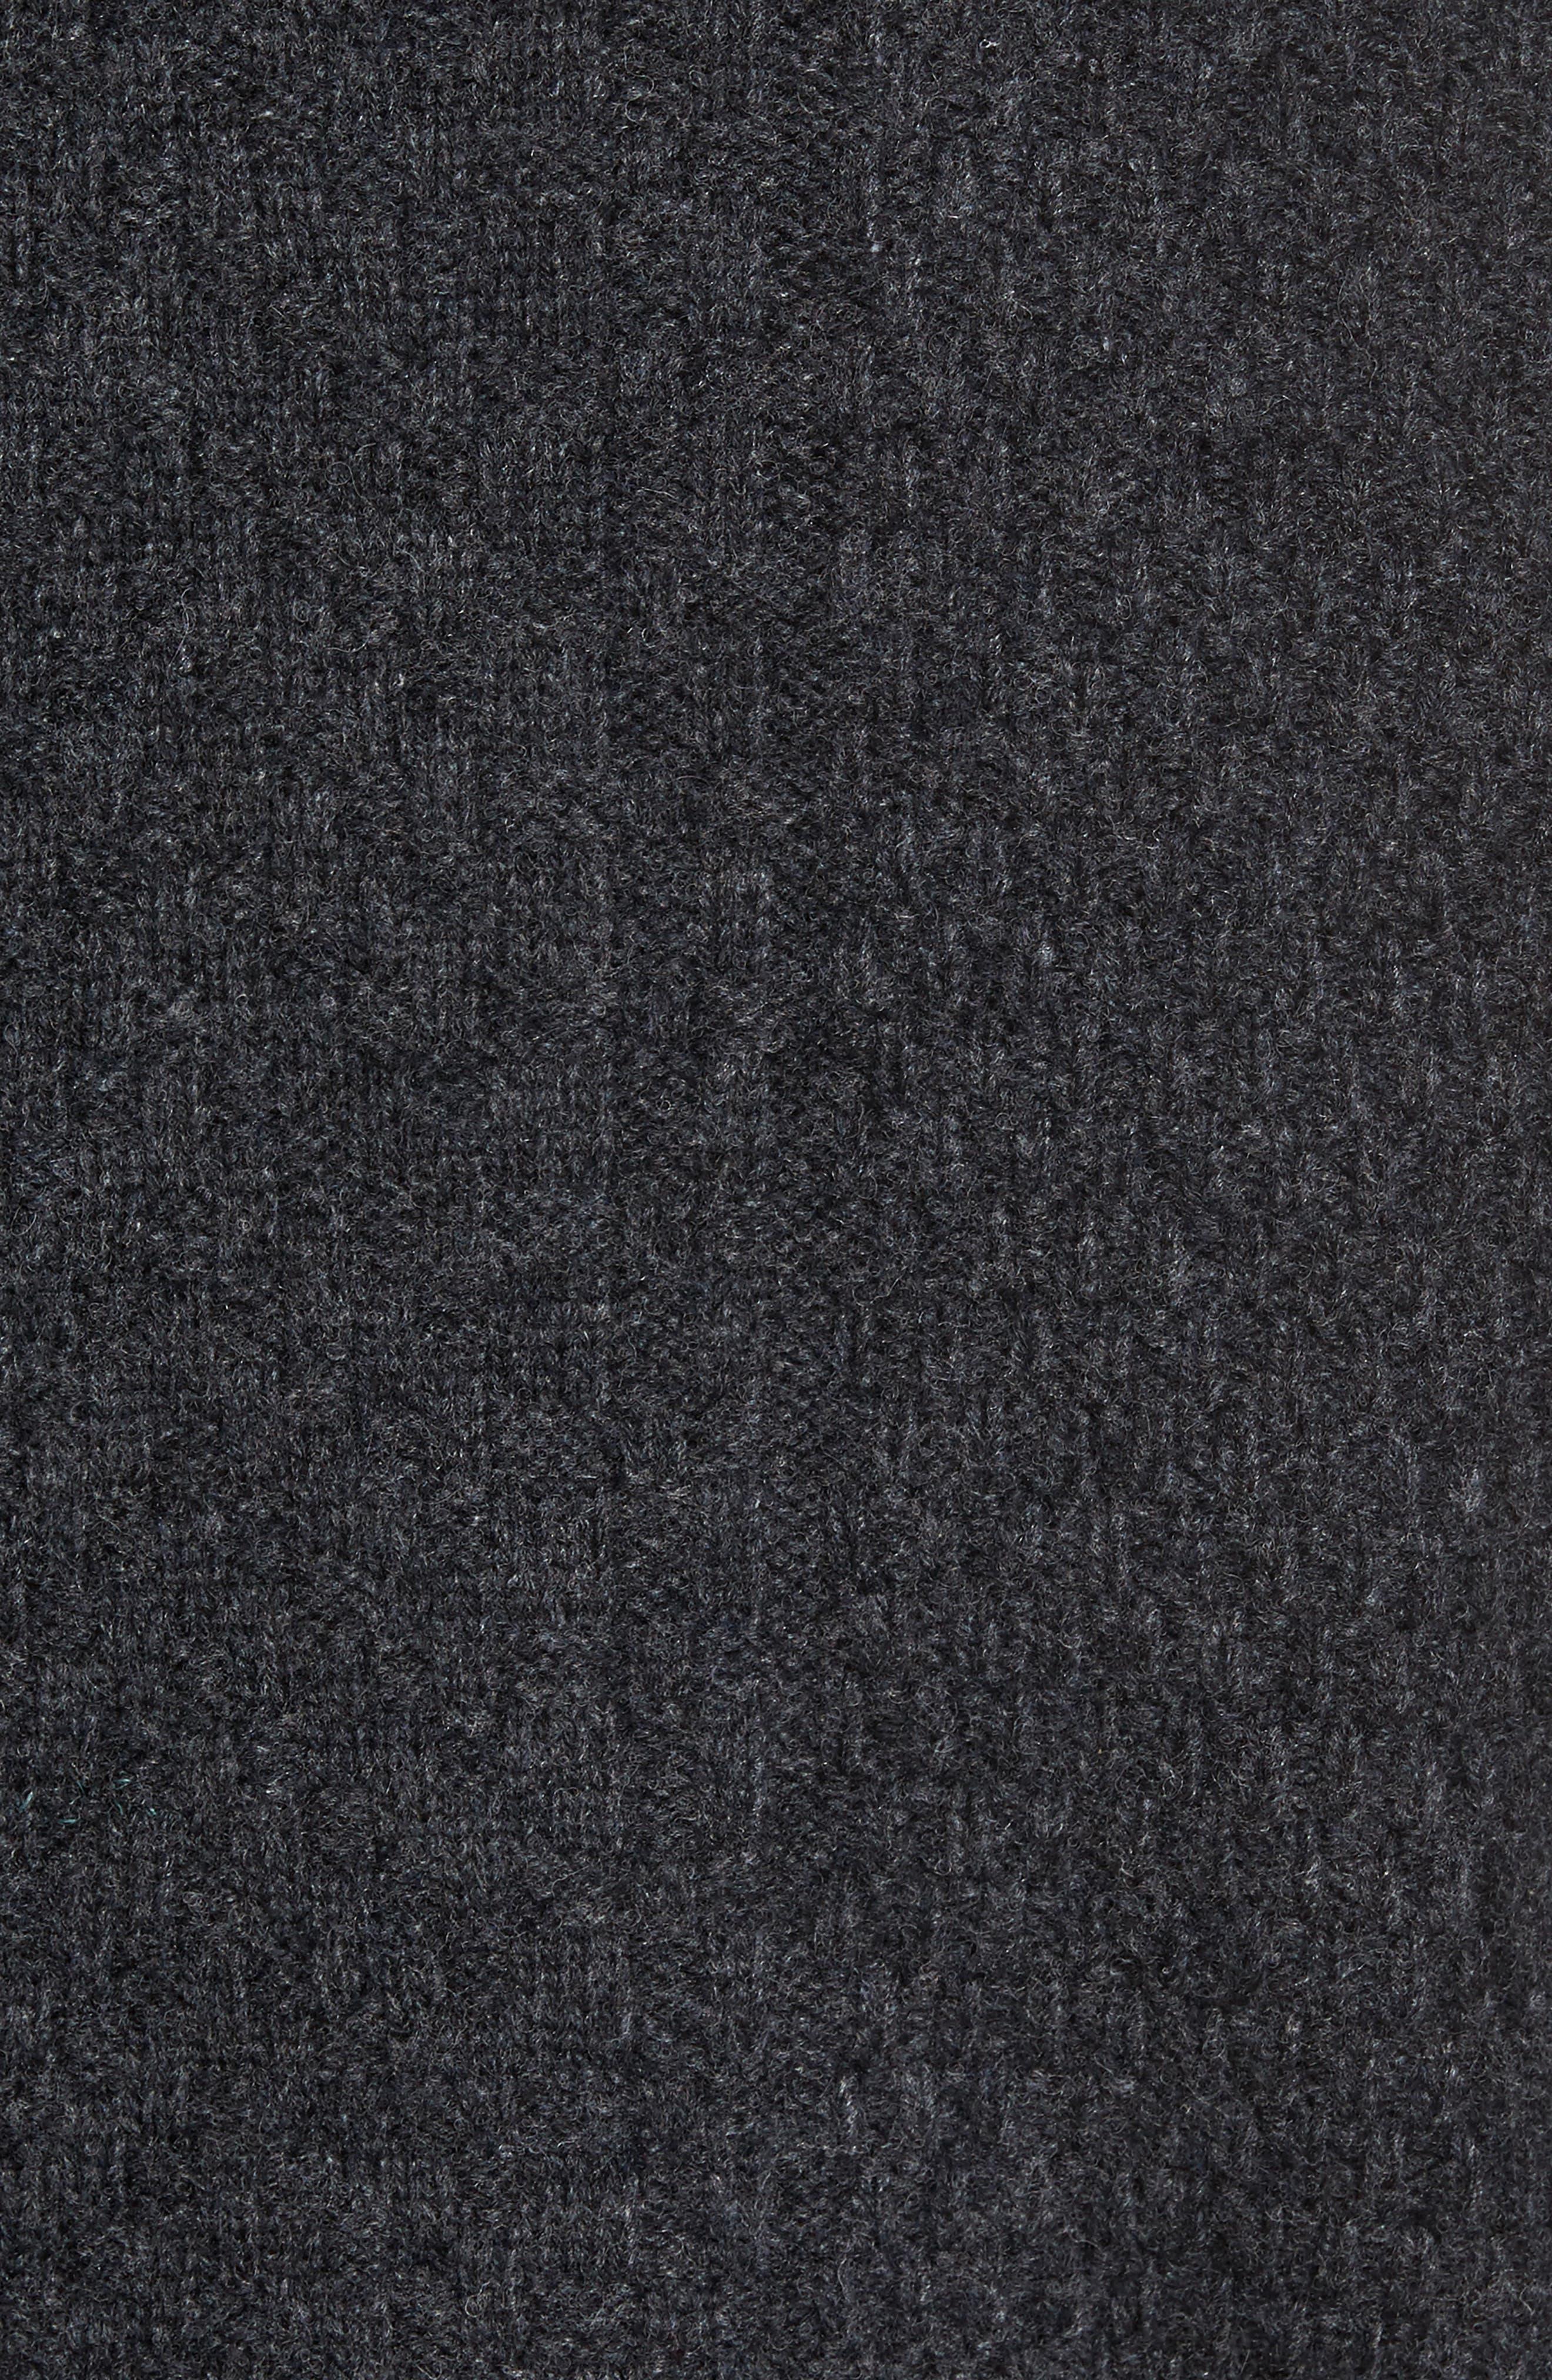 Wool Crewneck Sweater,                             Alternate thumbnail 5, color,                             020